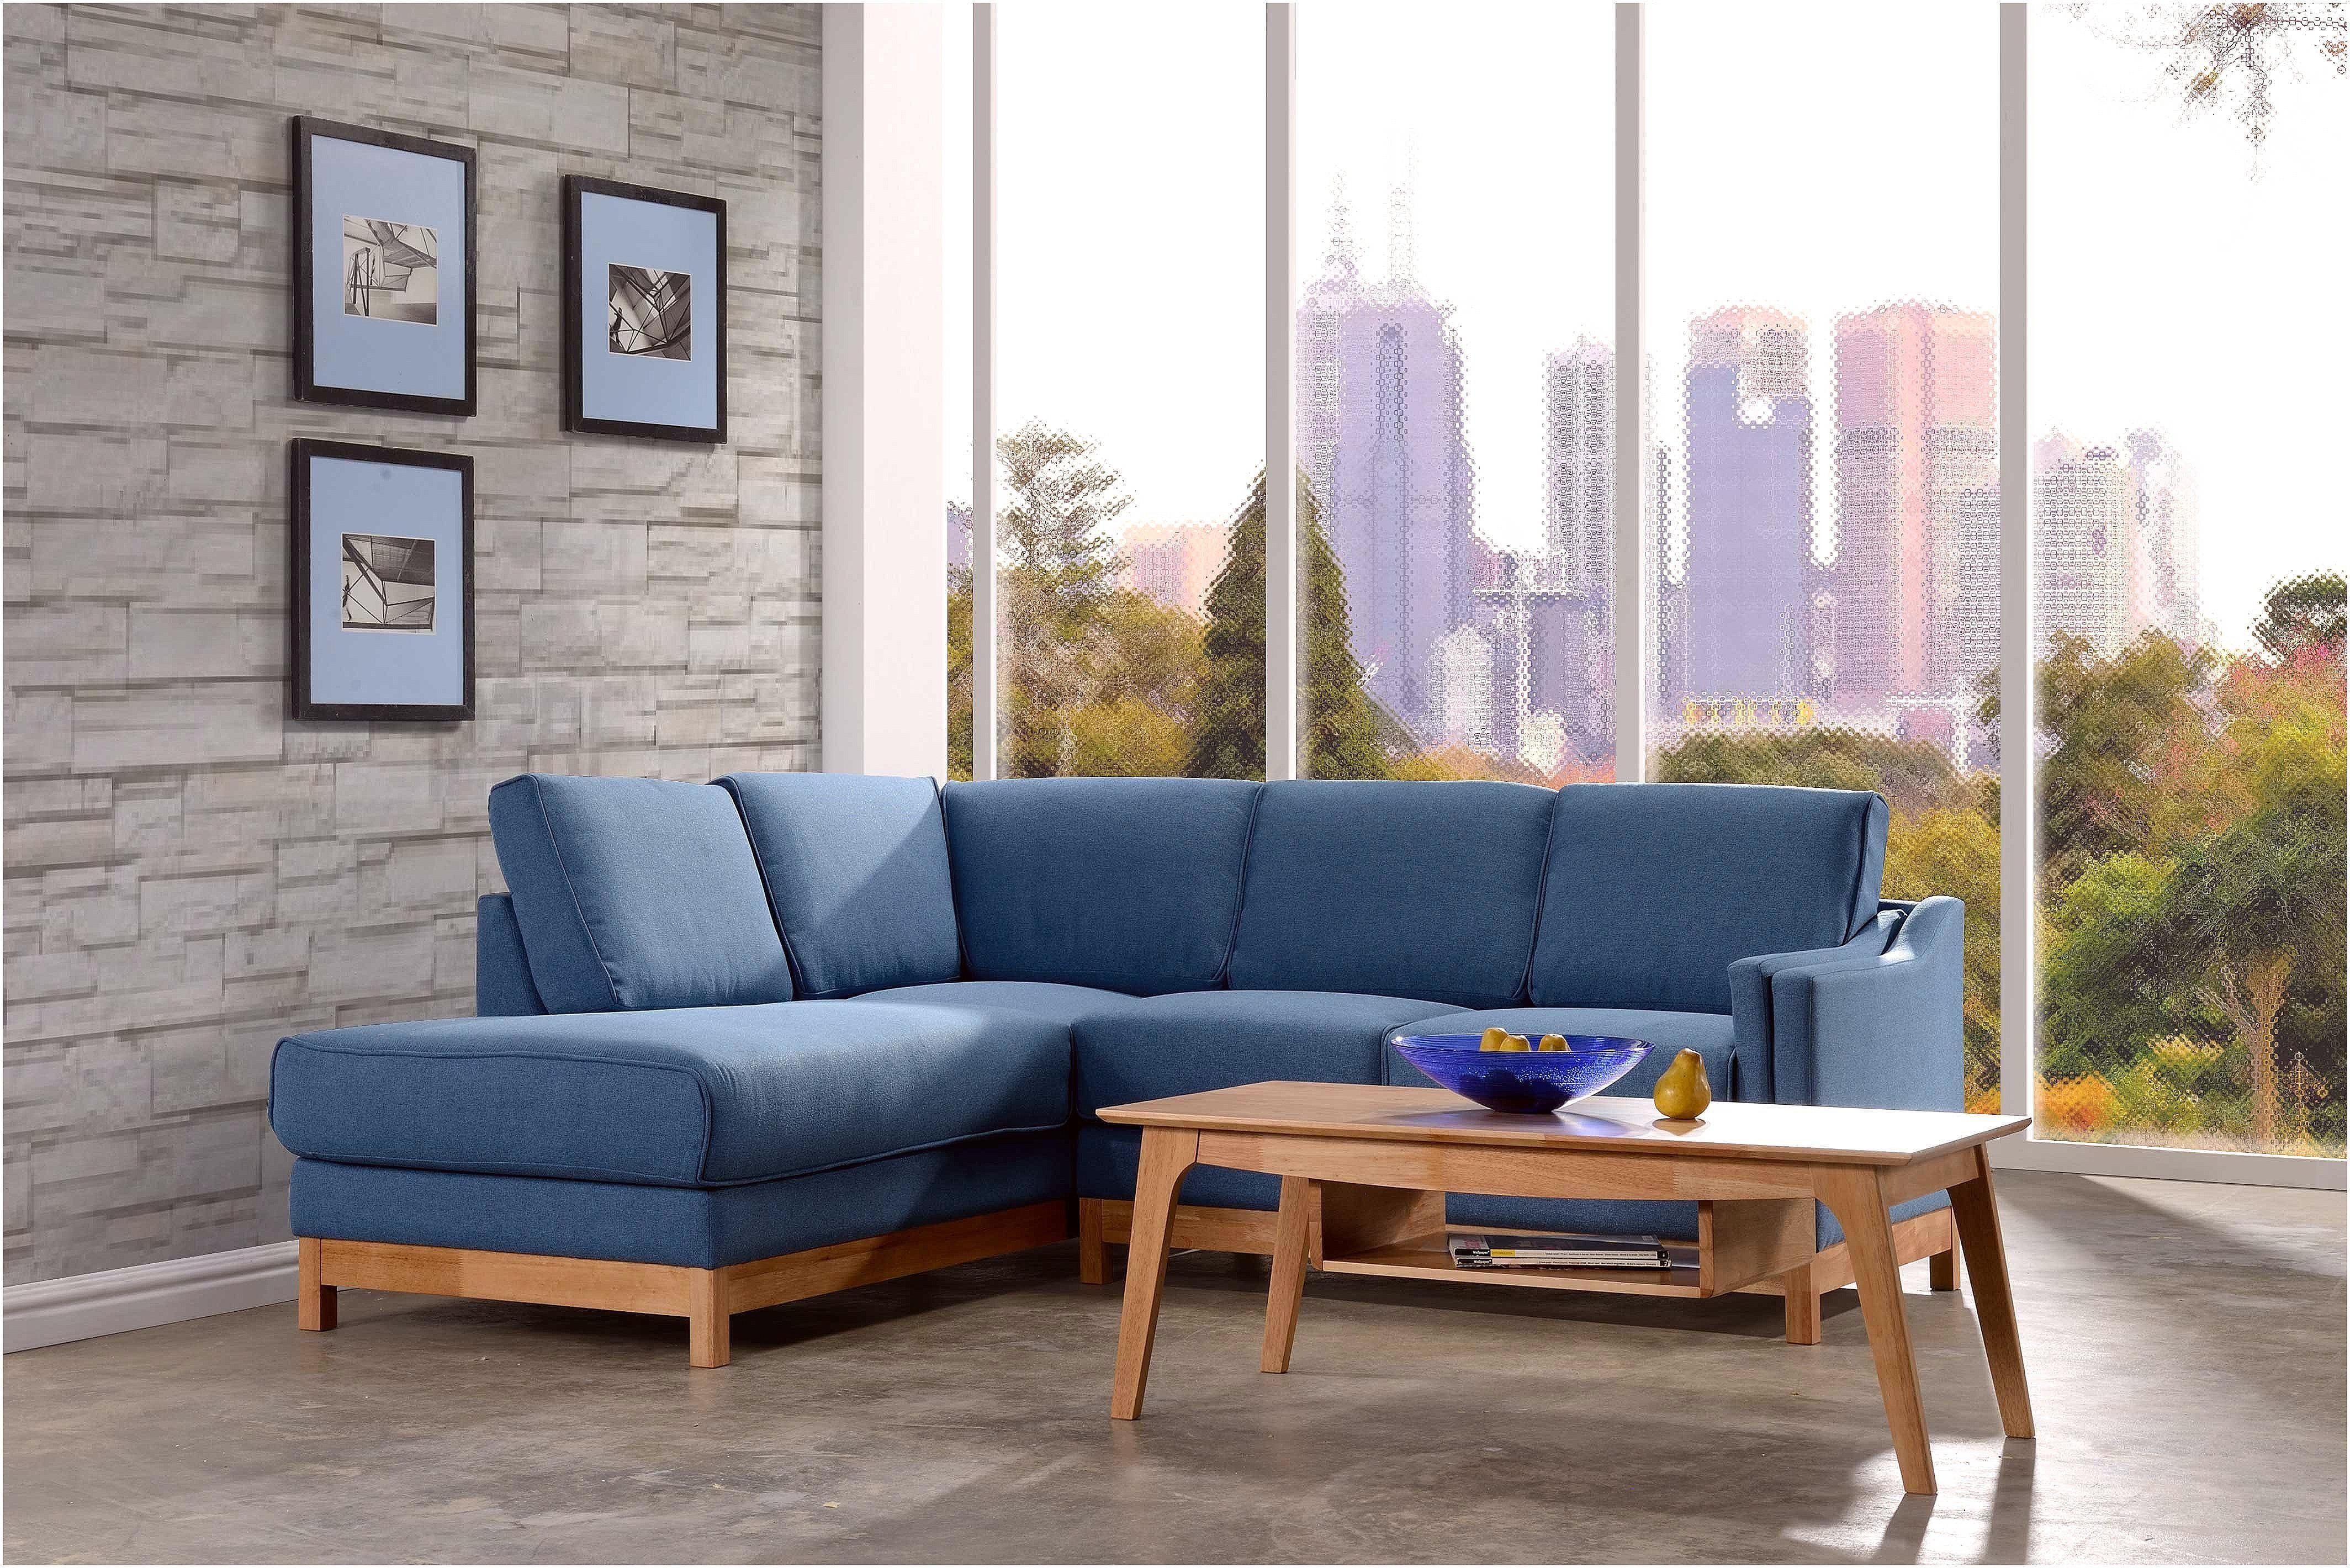 Elegant Small Living Room Ideas Philippines Blue Living Room Blue Living Room Decor Blue Sofa Living